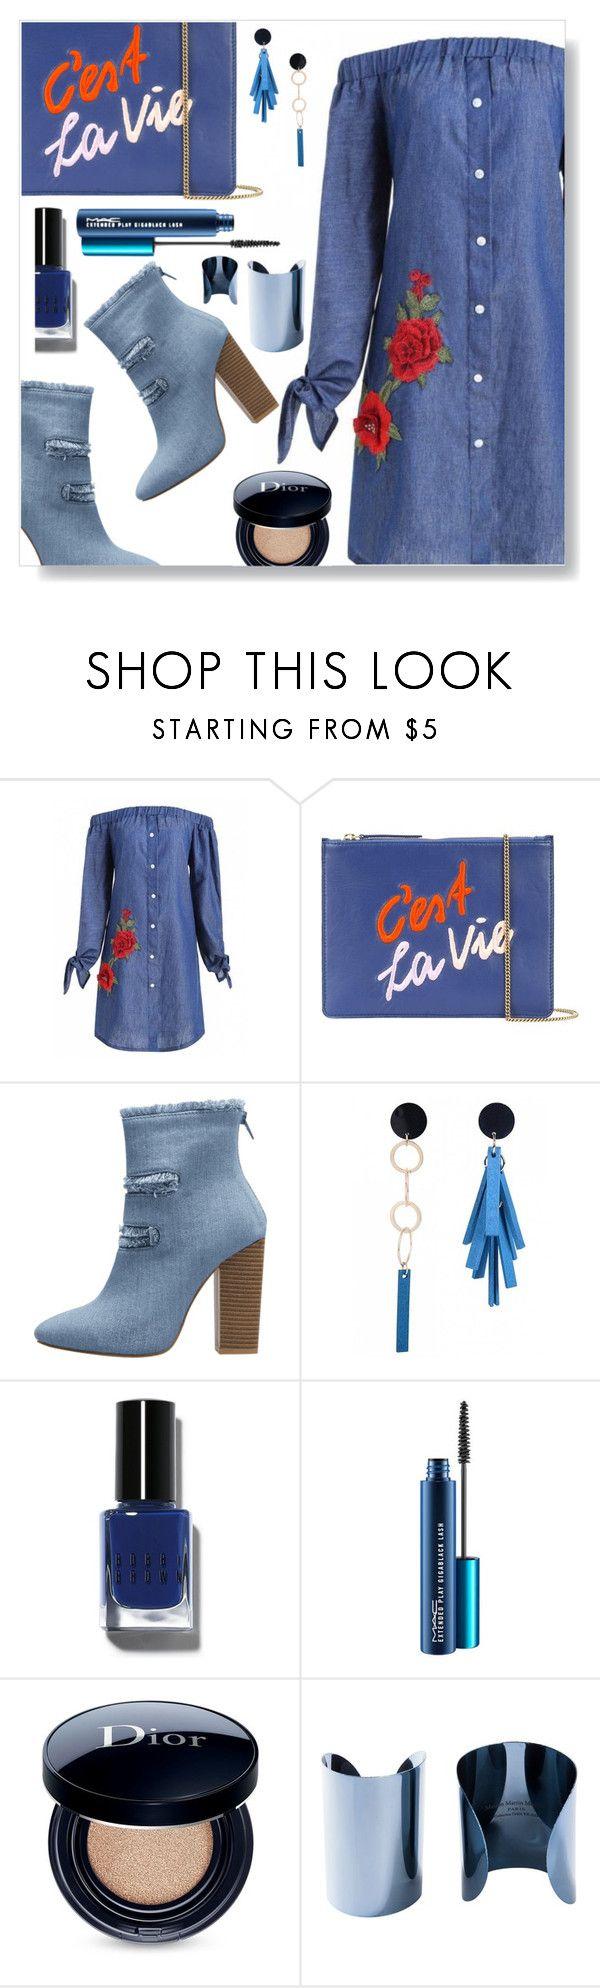 """C'est la vie ...."" by simona-altobelli ❤ liked on Polyvore featuring Lizzie Fortunato, Bobbi Brown Cosmetics, Christian Dior and Maison Margiela"